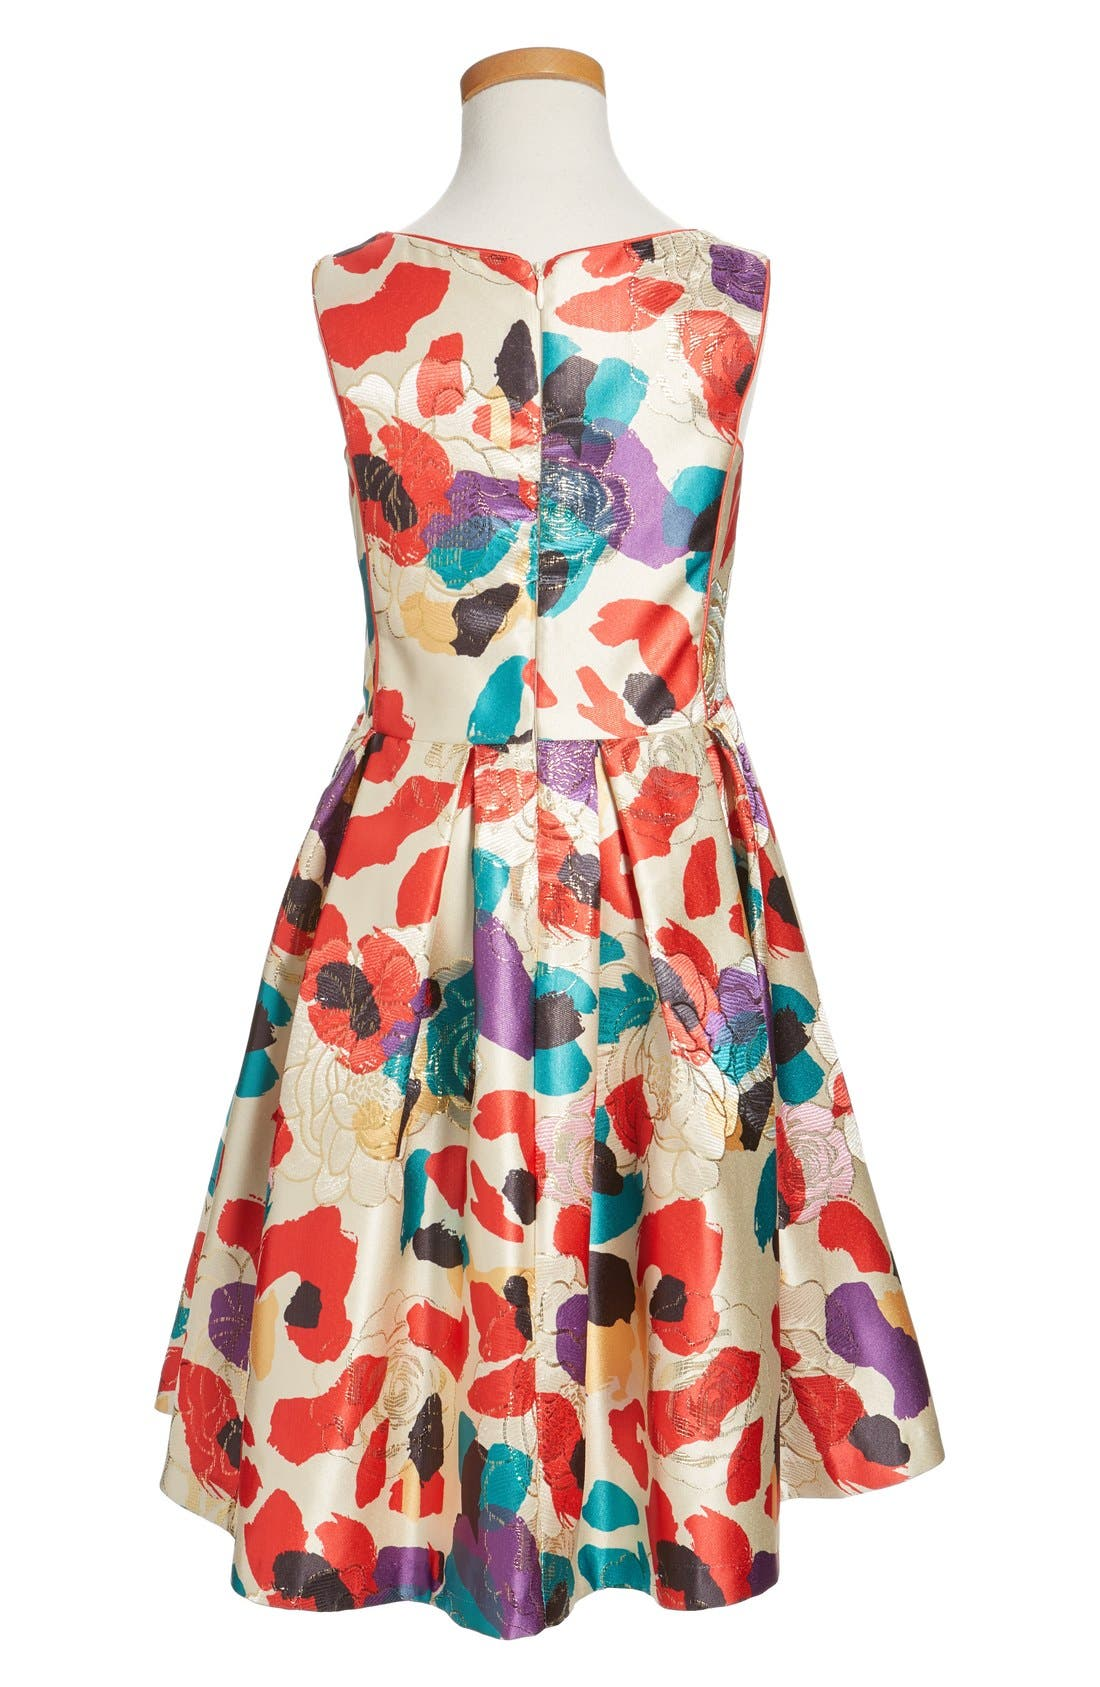 Watercolor Floral Brocade Dress,                             Alternate thumbnail 4, color,                             Multi Red